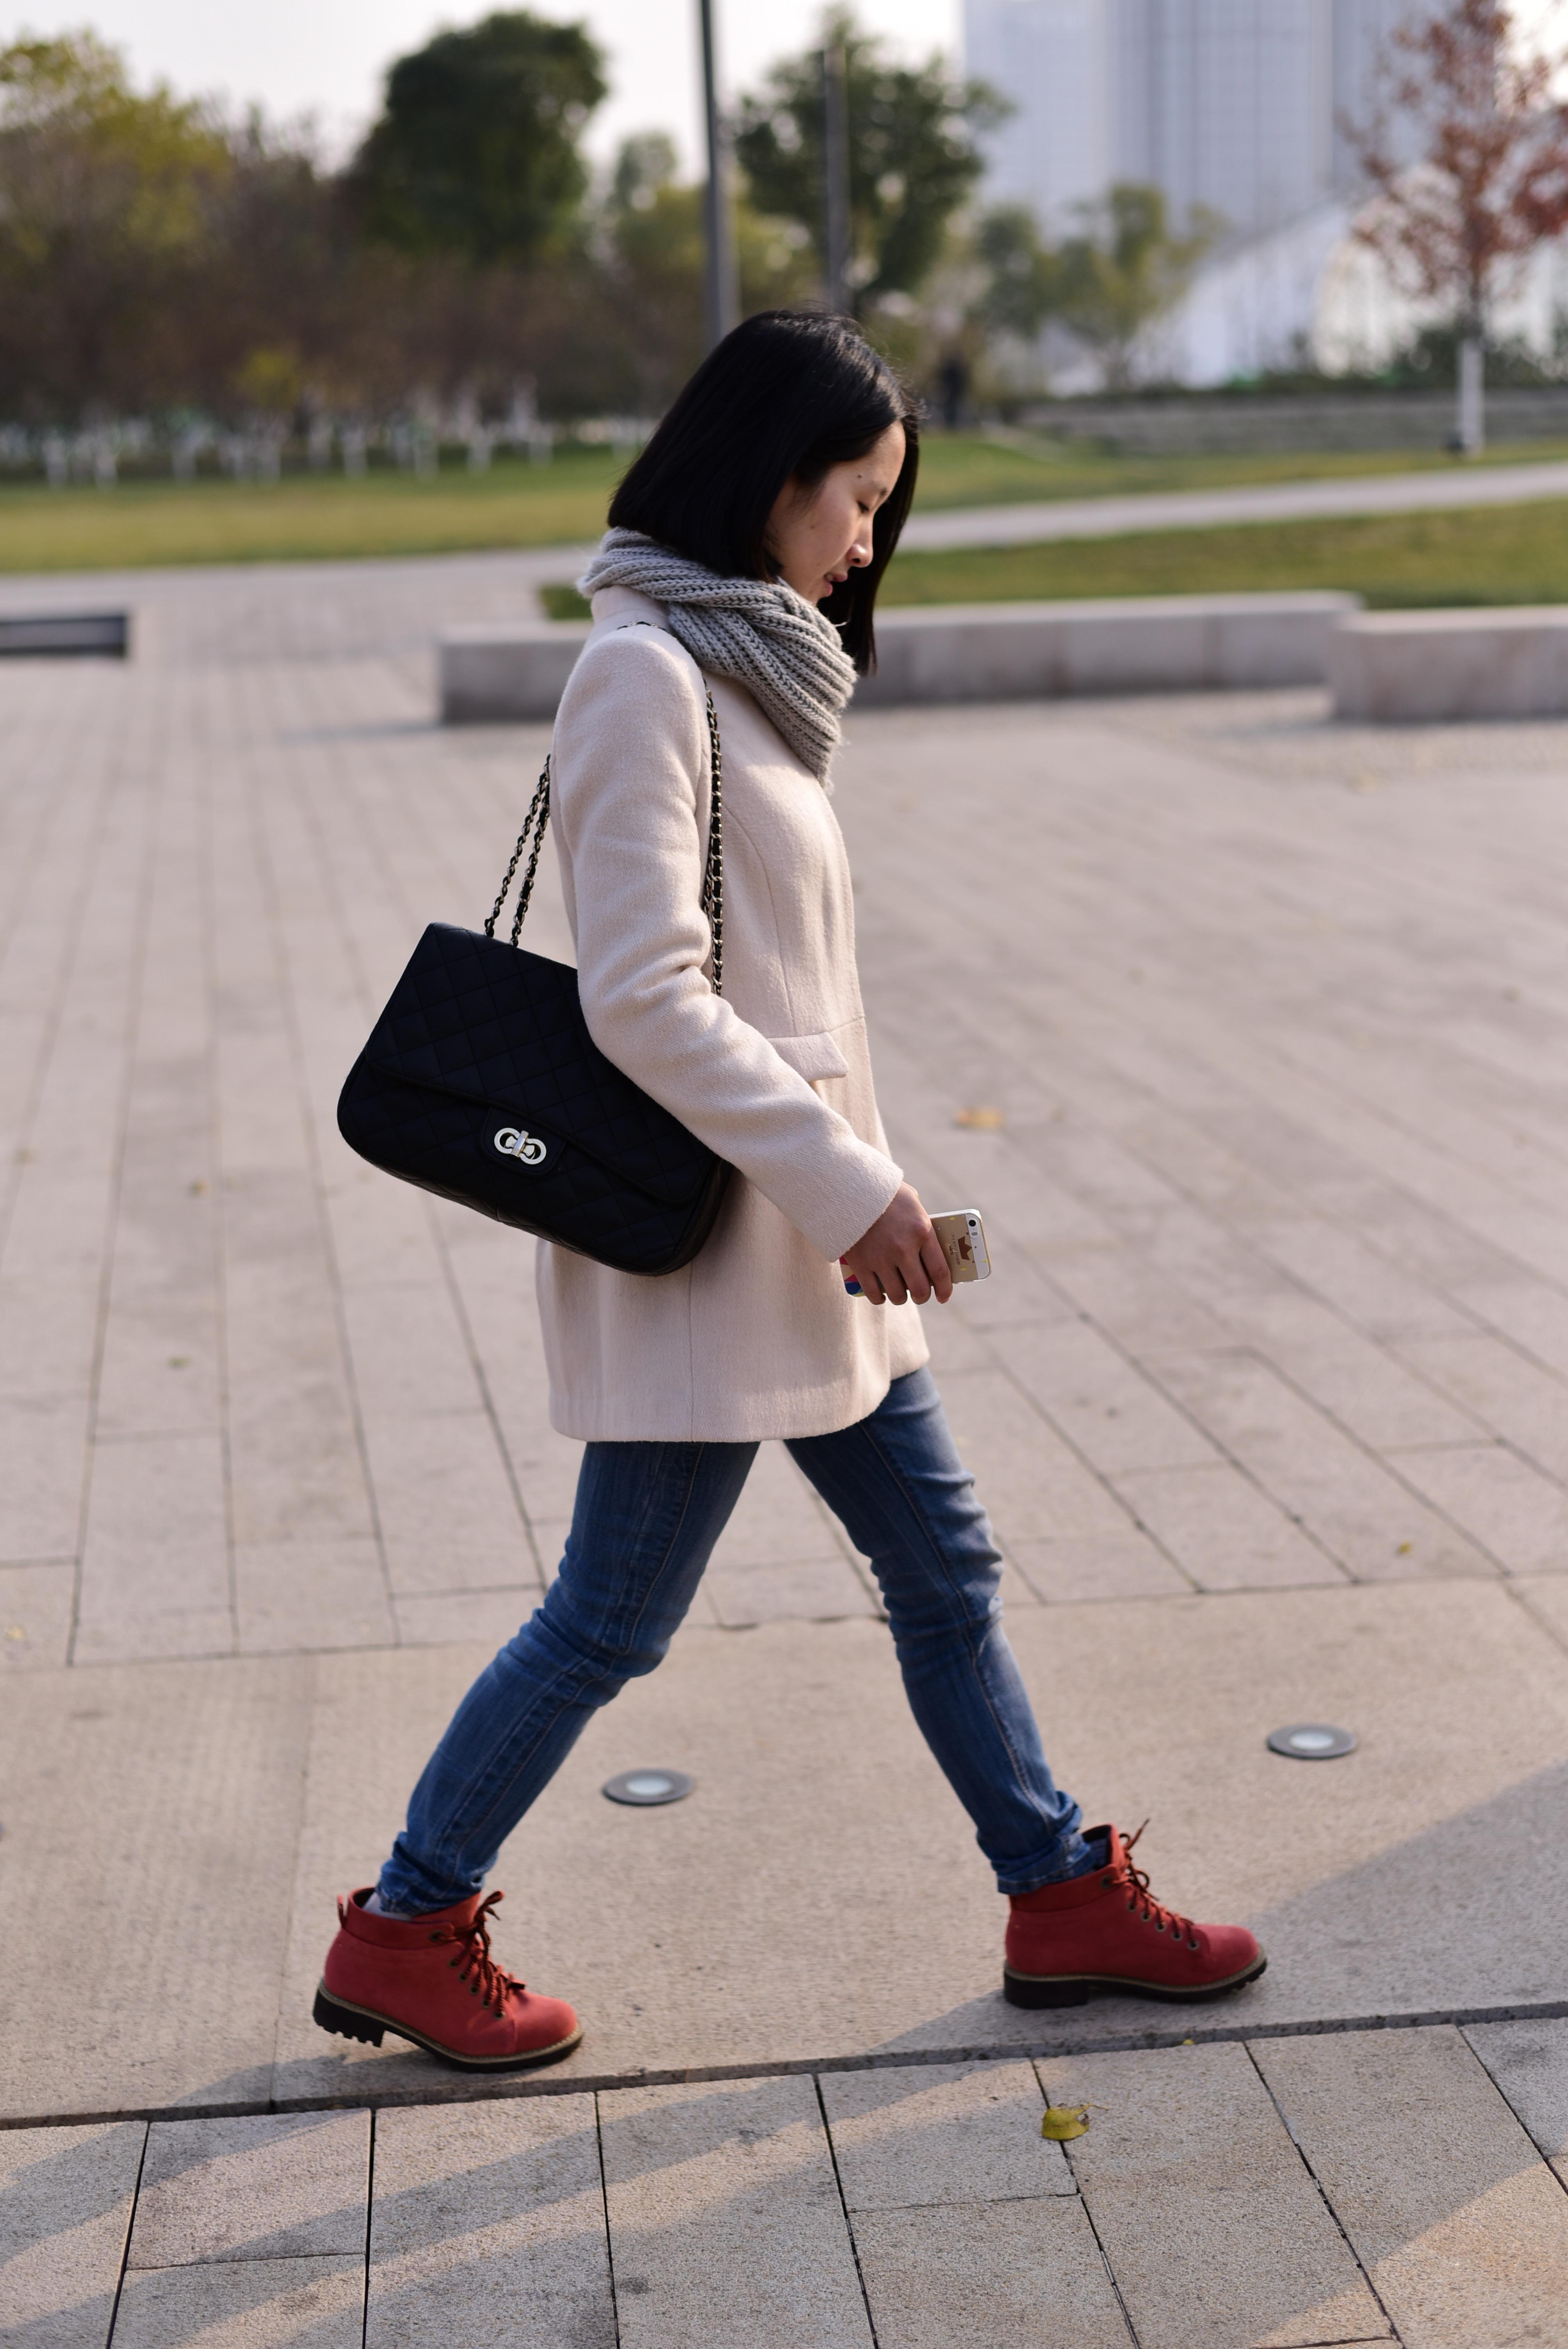 Free Images : walking, person, shoe, girl, woman, walk ...